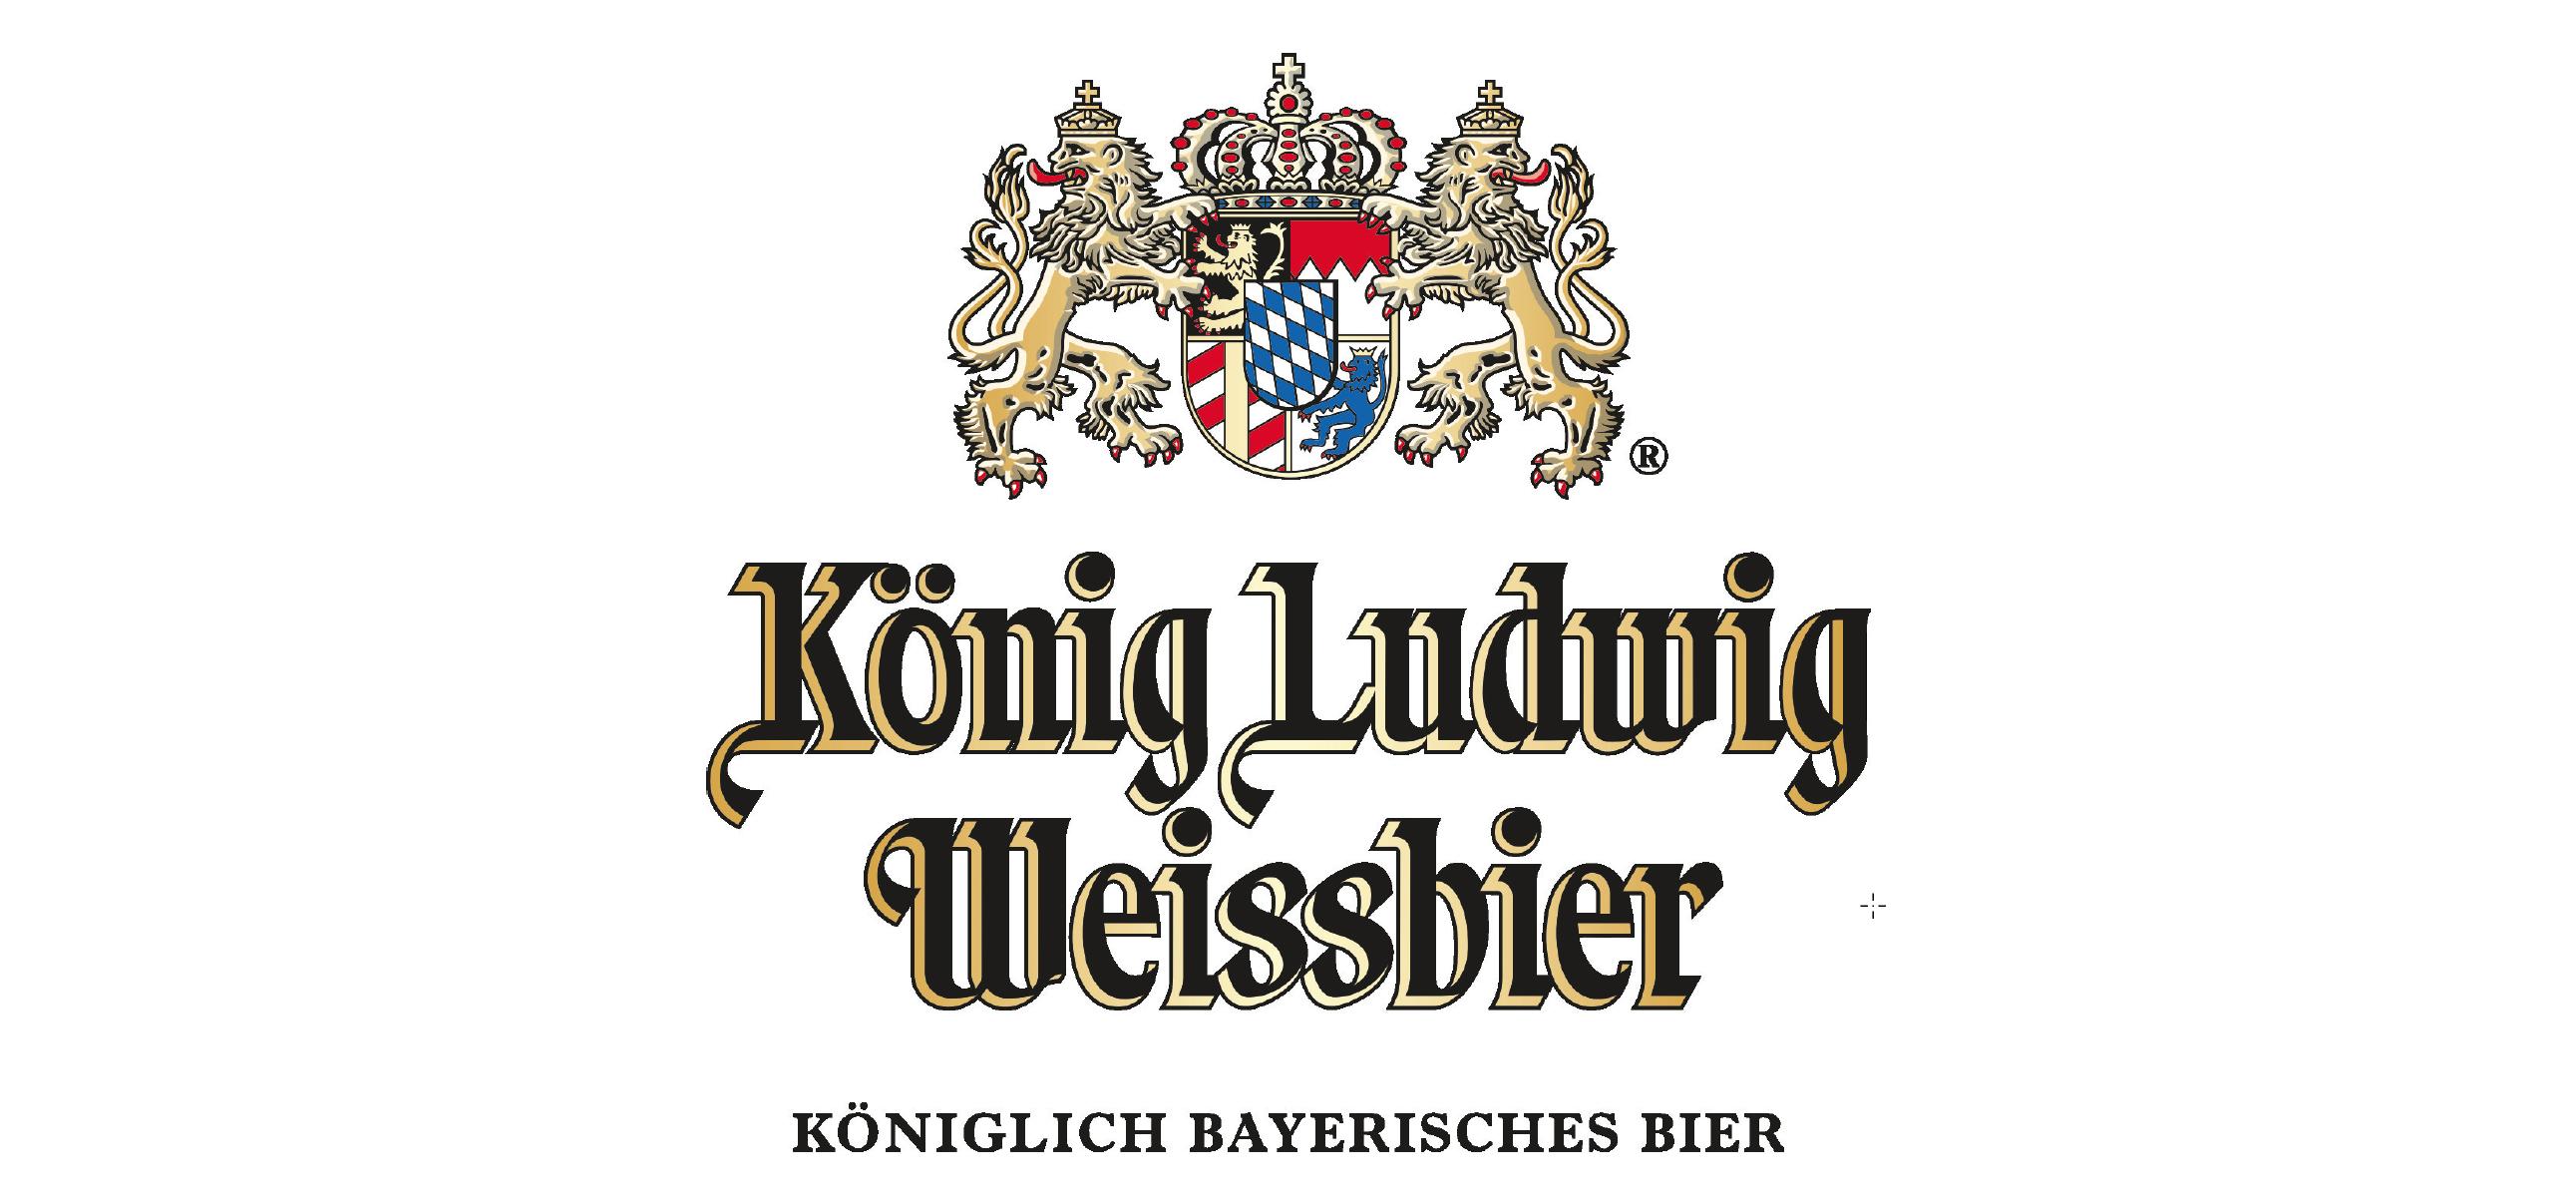 Koenig-Ludwig